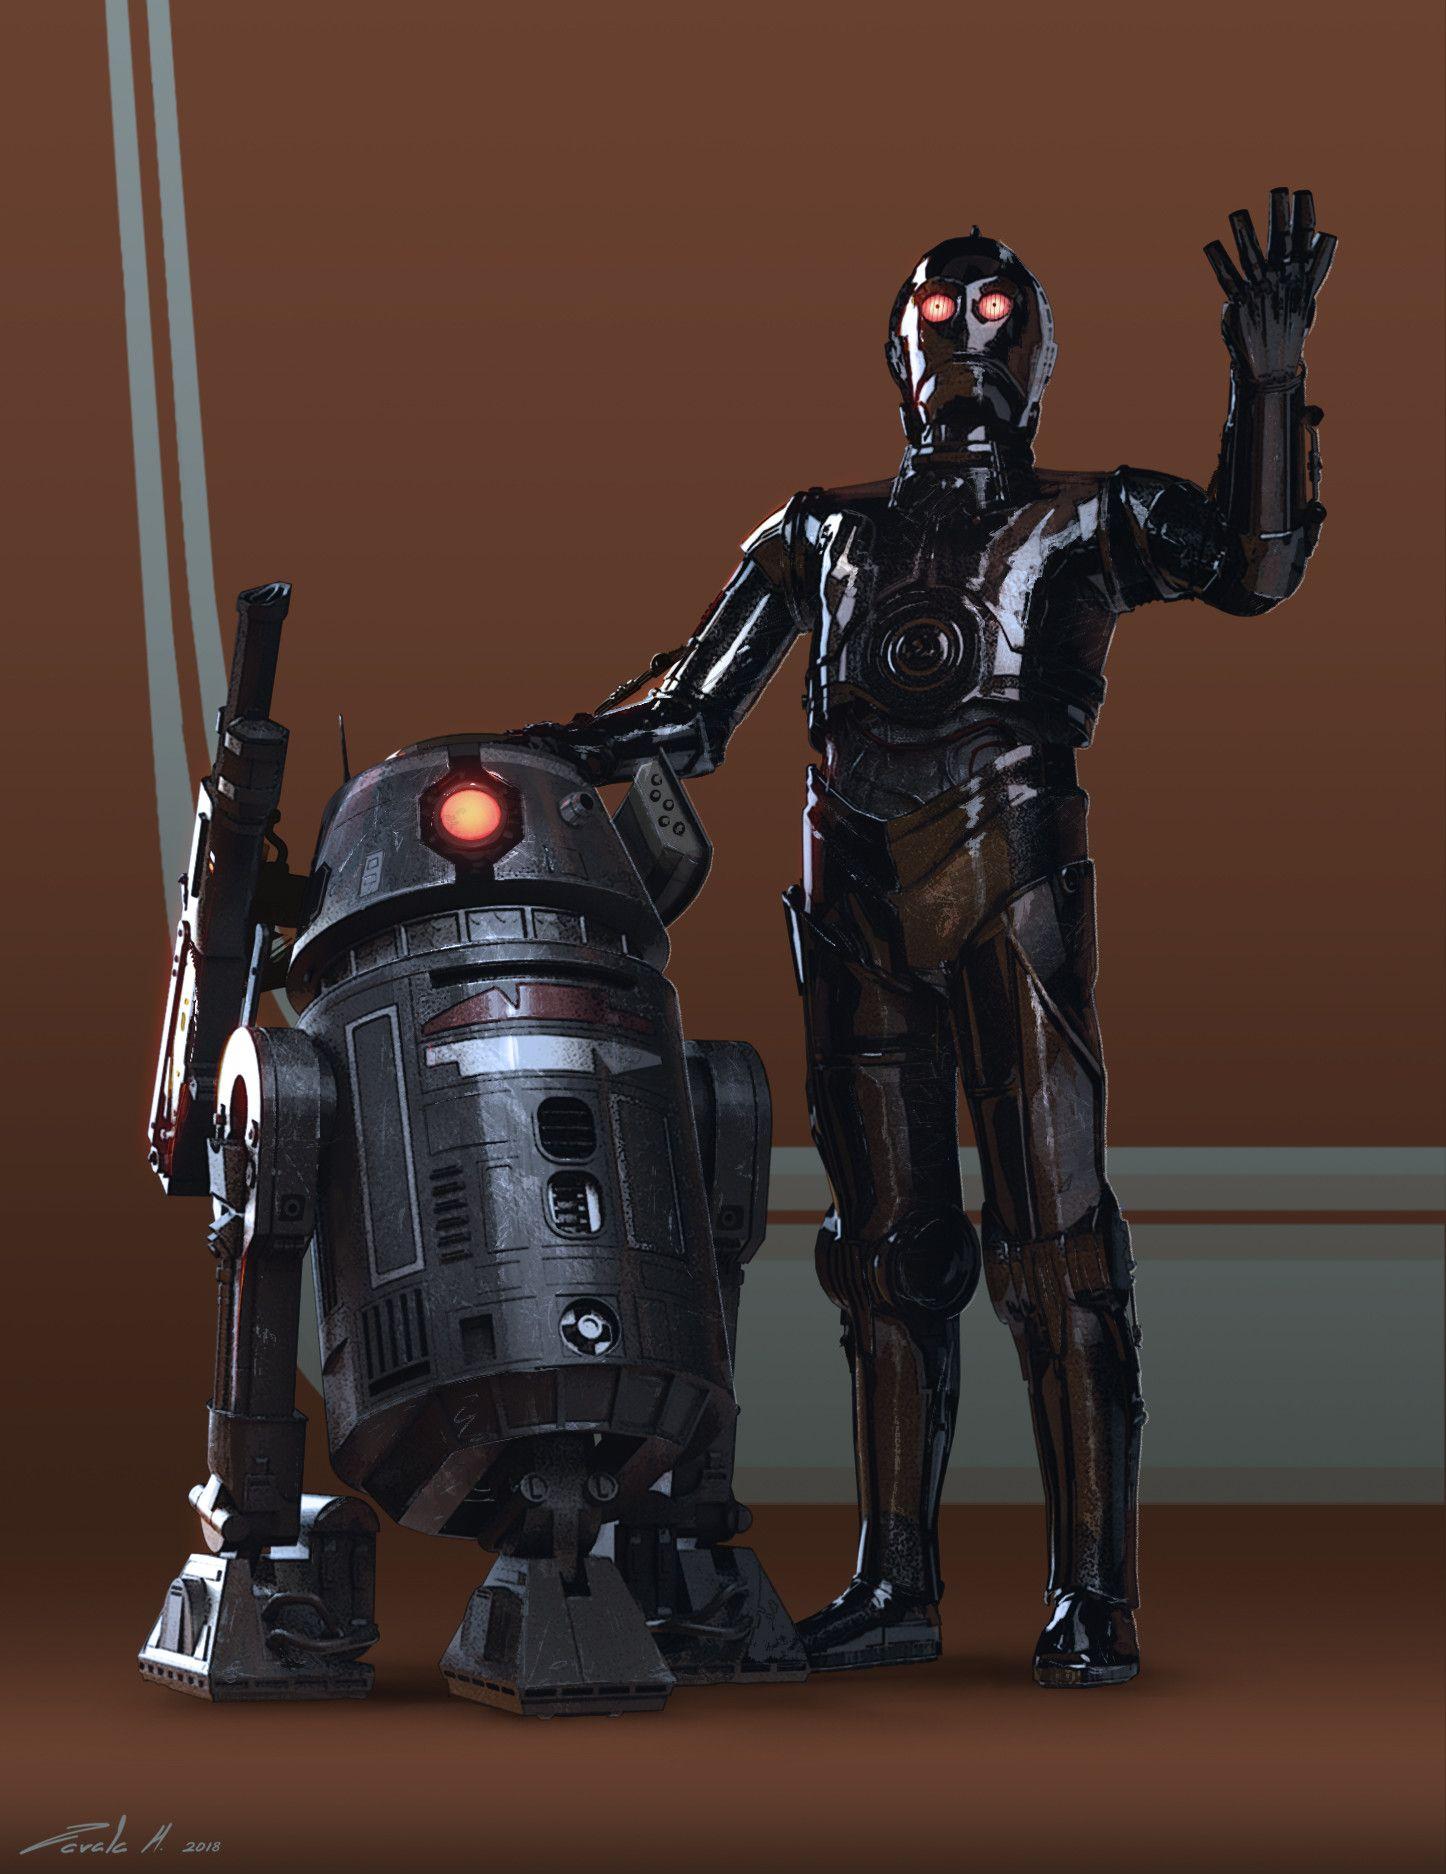 Artstation Bt 1 And 0 0 0 Stephen Zavala Star Wars Rpg Star Wars Canon Star Wars Droids